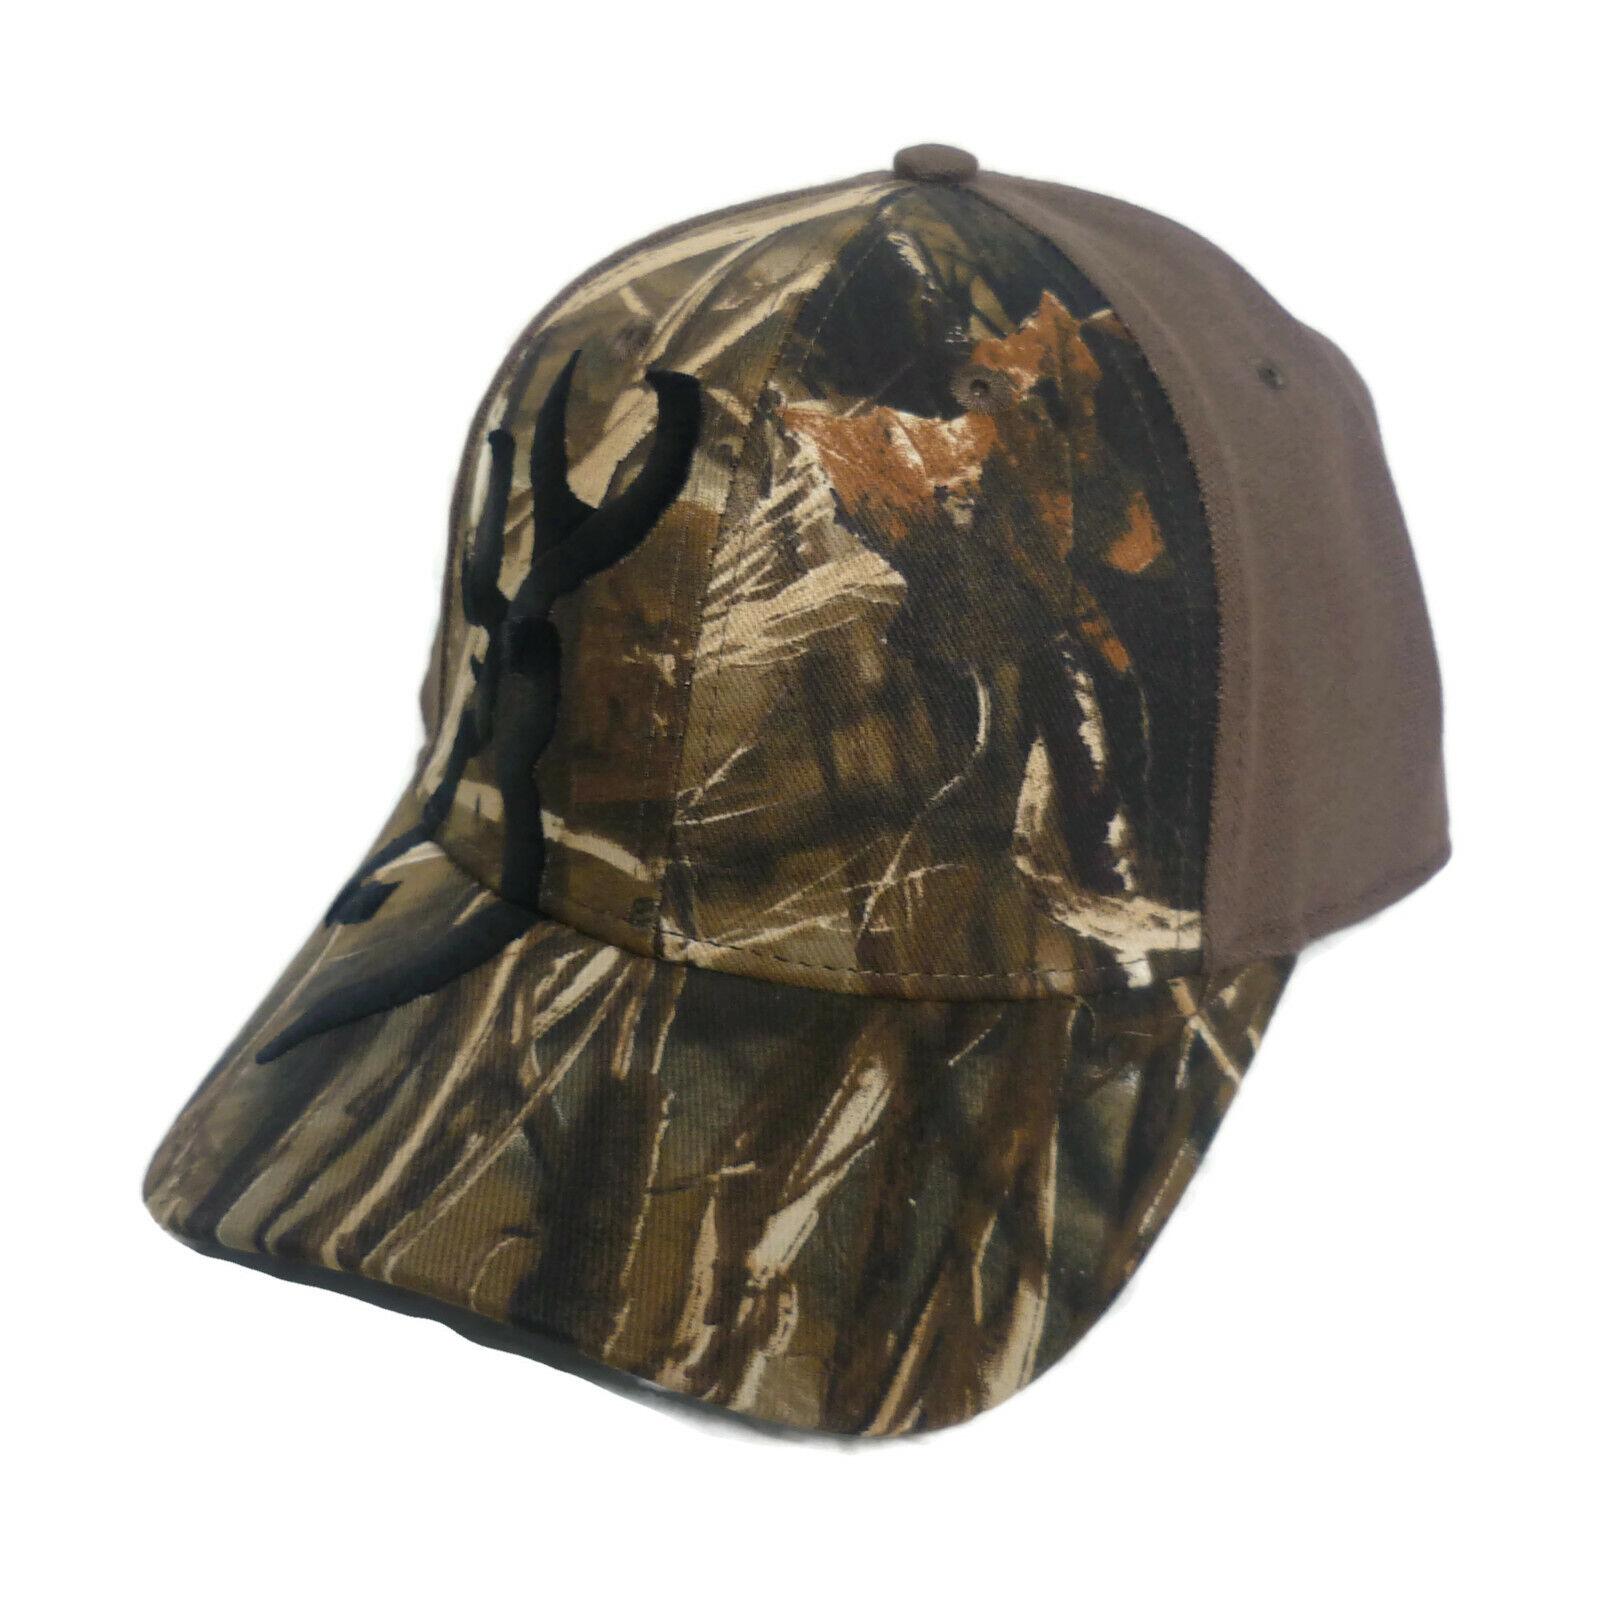 BROWNING UNLIMITED CAP, Jagd Kappe, Jagd Mütze, Basecap, Baseballmütze, uni size